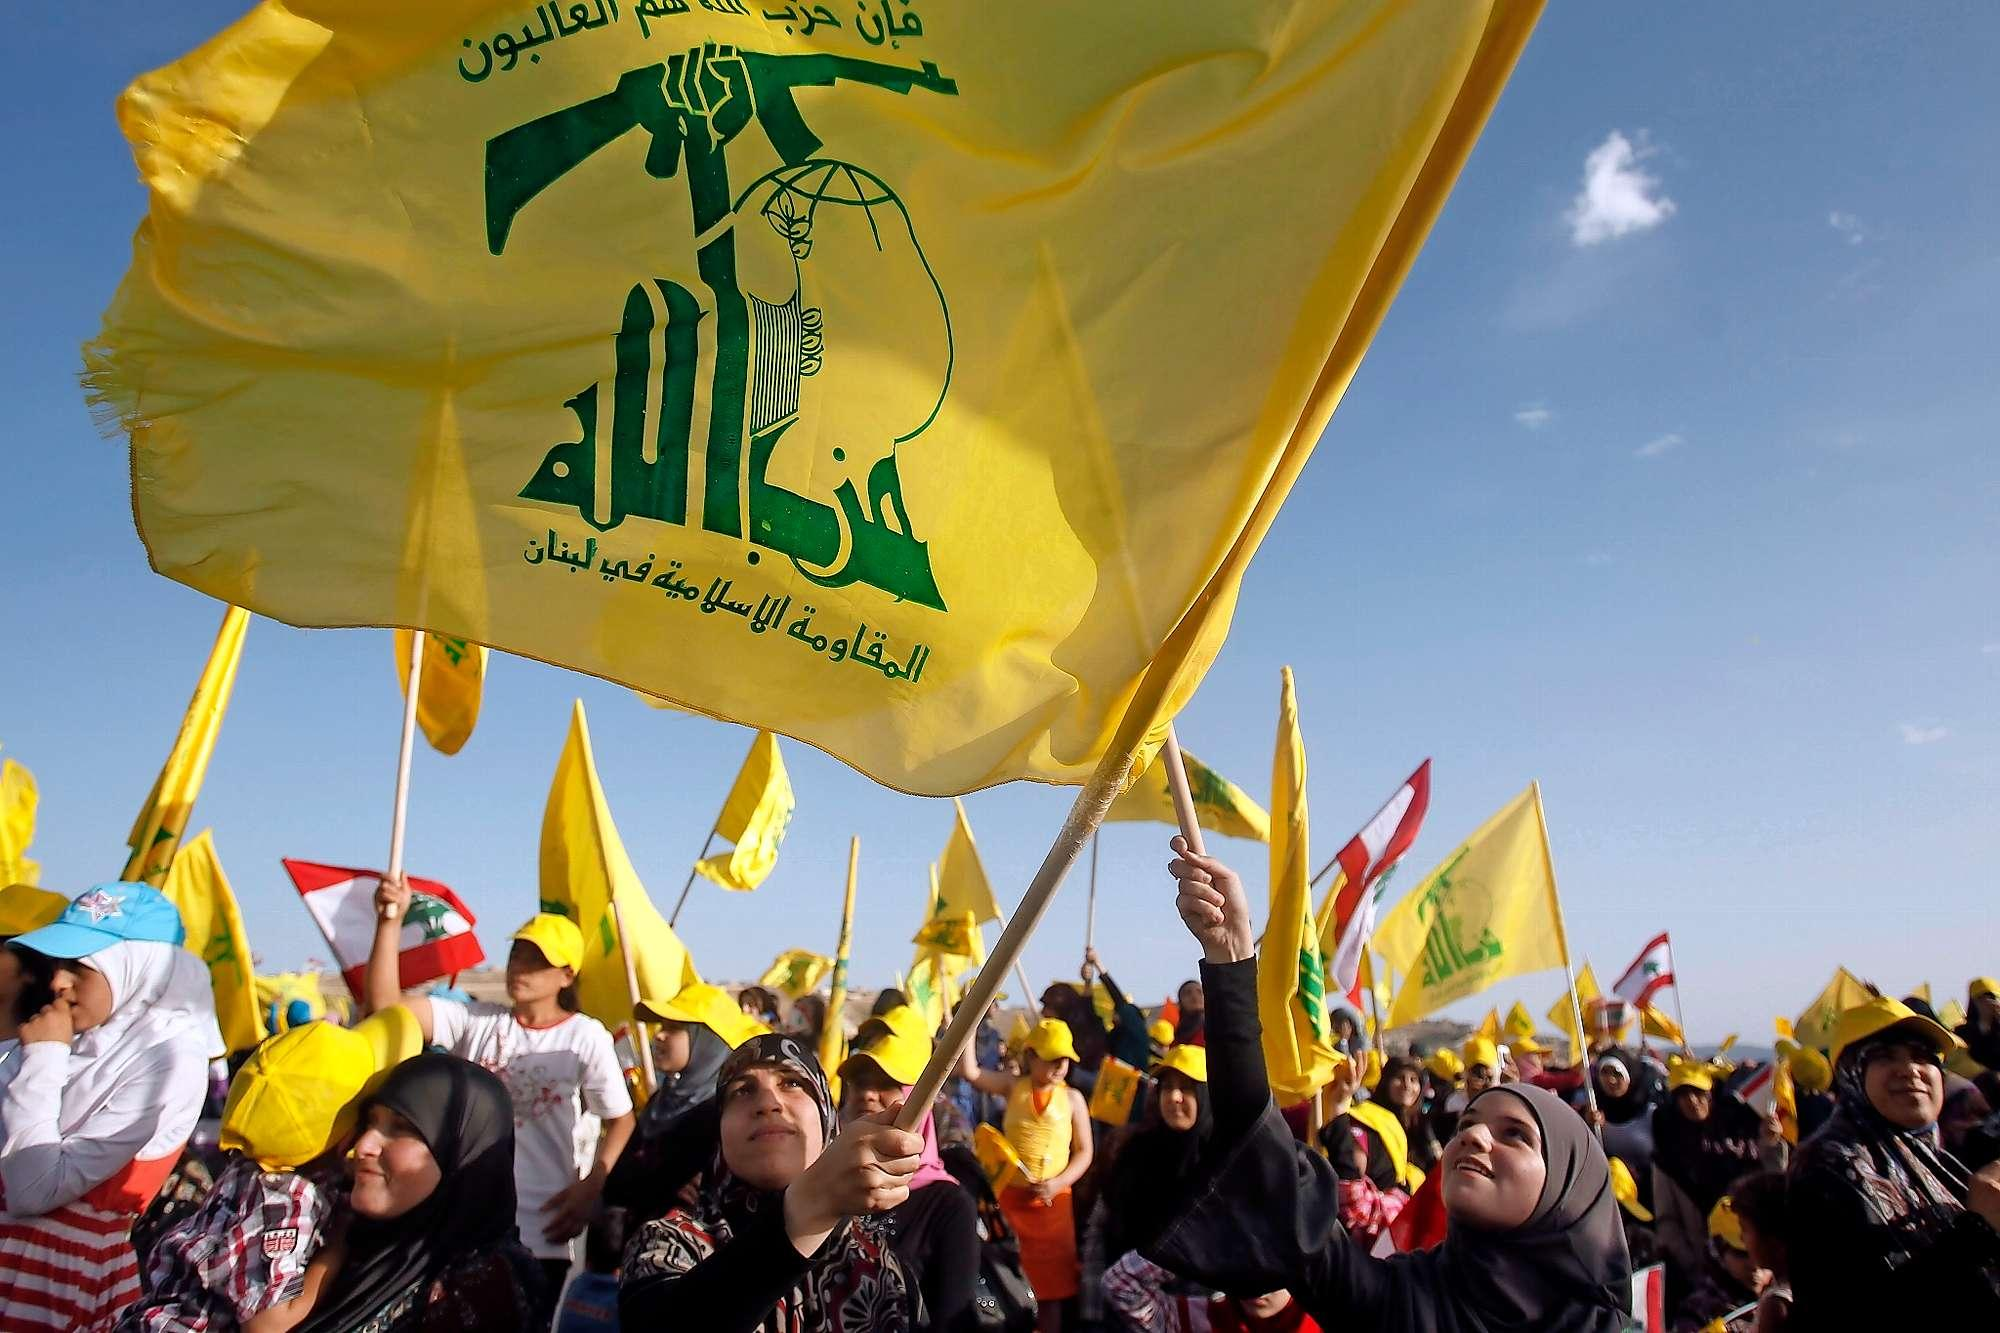 Hezbollah-Lebanon / حزب الله و توازن القوى في لبنان